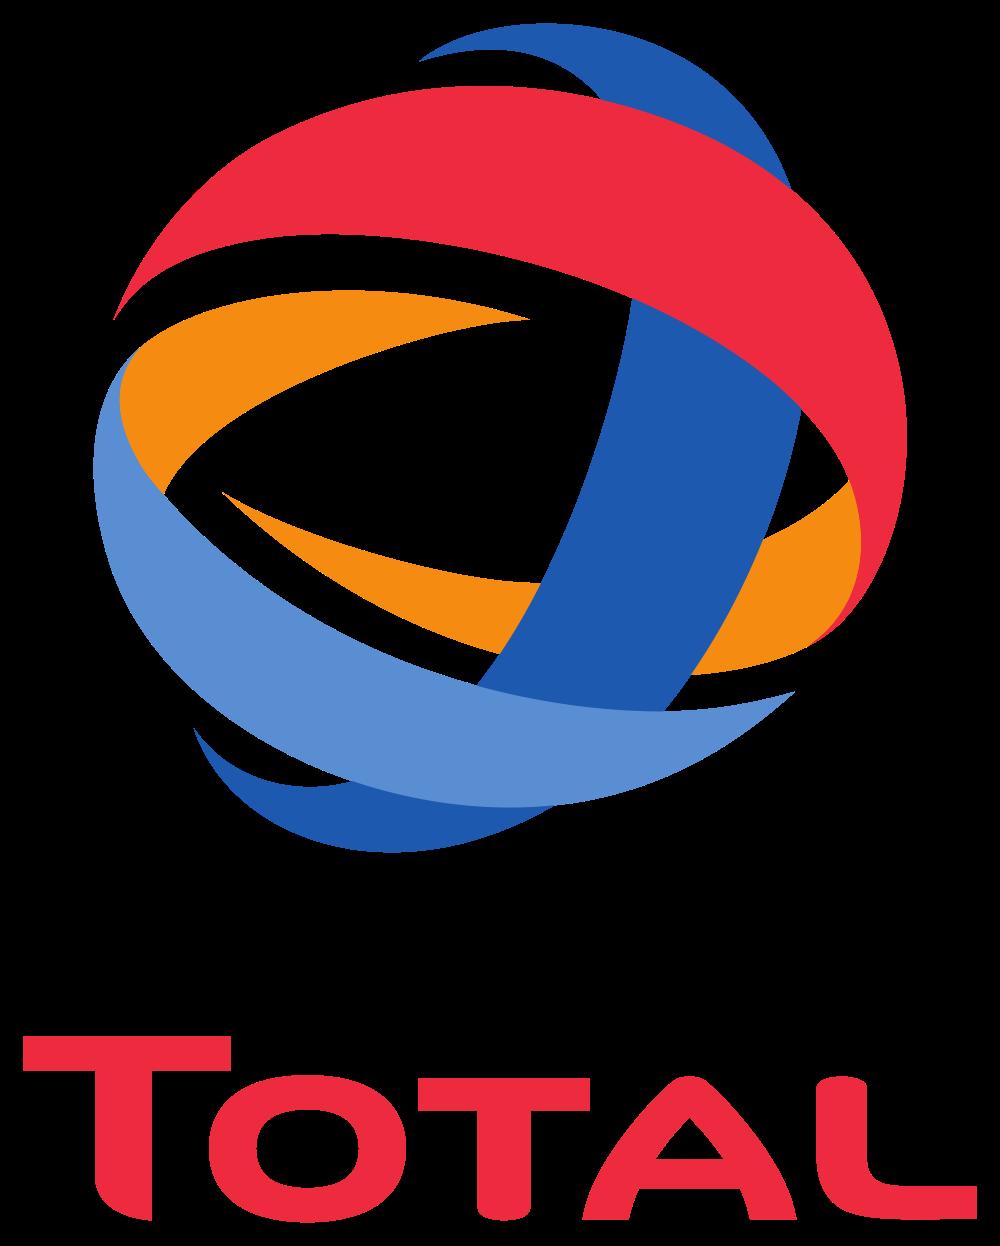 Total Logo Wallpaper